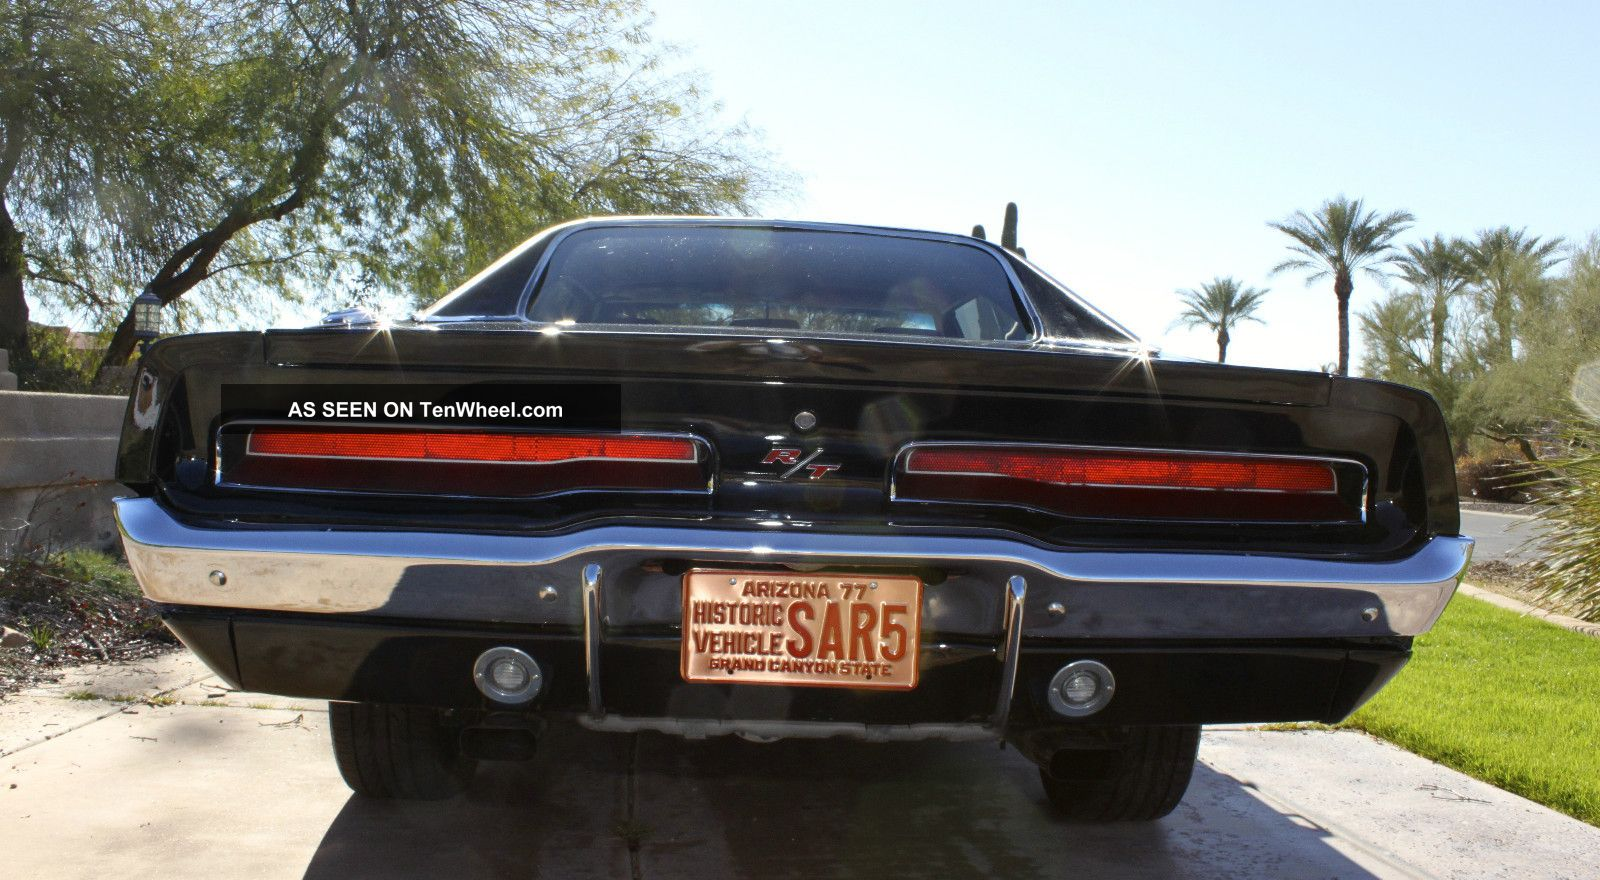 1969 Dodge Charger Rt Black Ac Vinyl Top